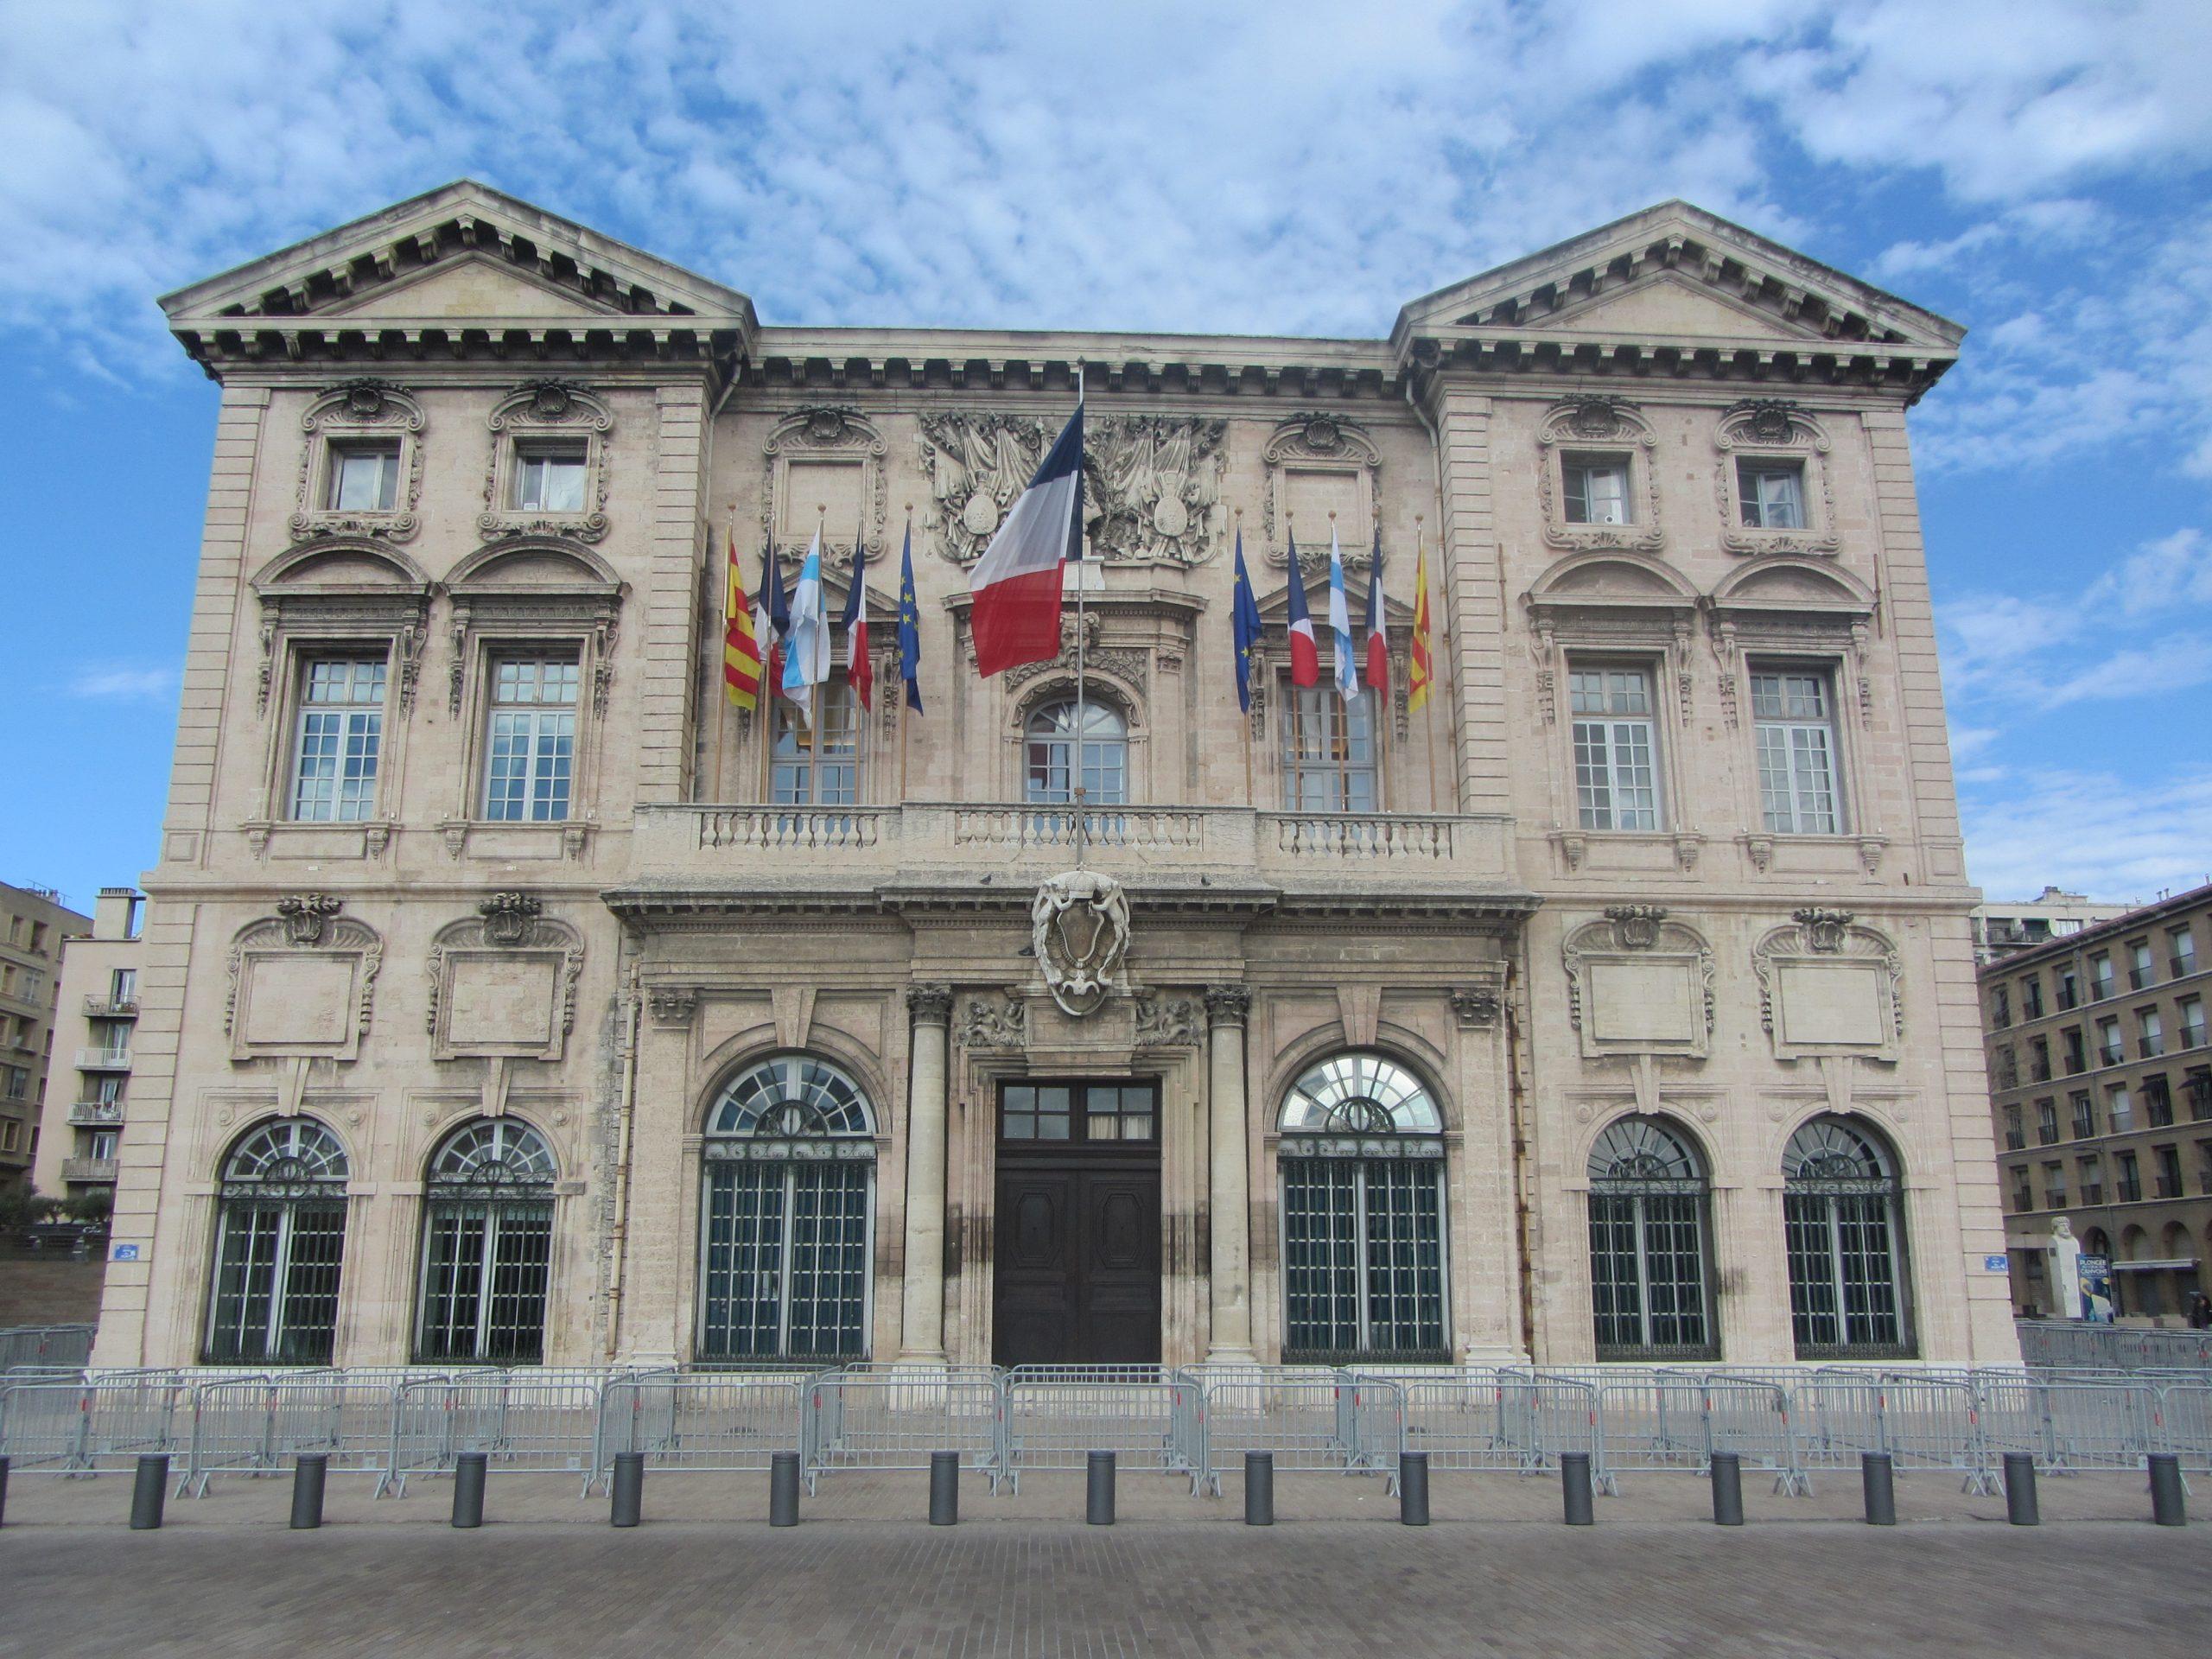 Hotel de Ville de Marseille